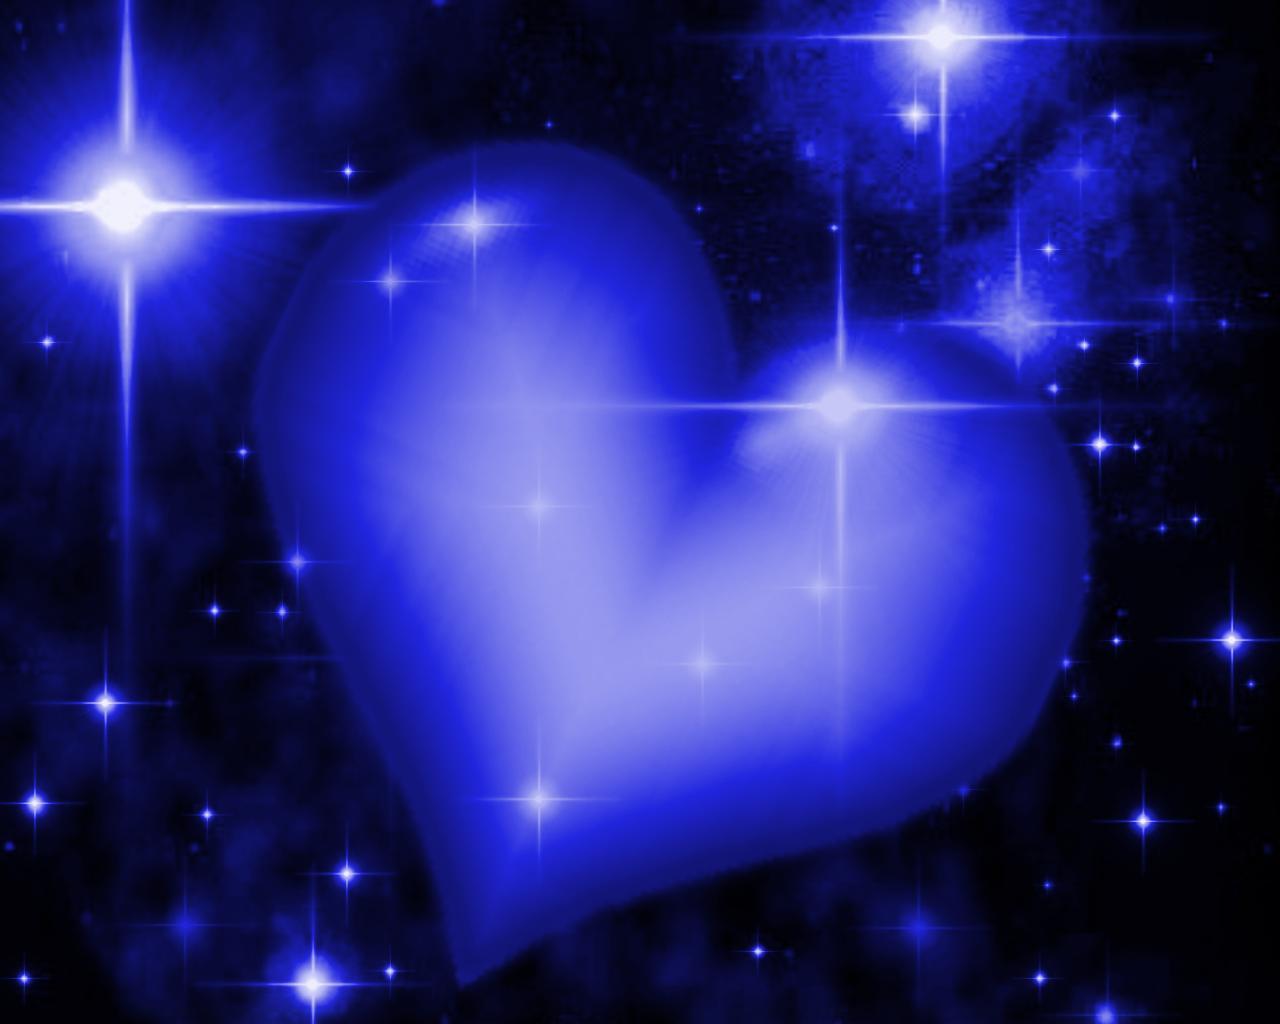 Royal Blue Hear... Blue Heart Background Wallpaper